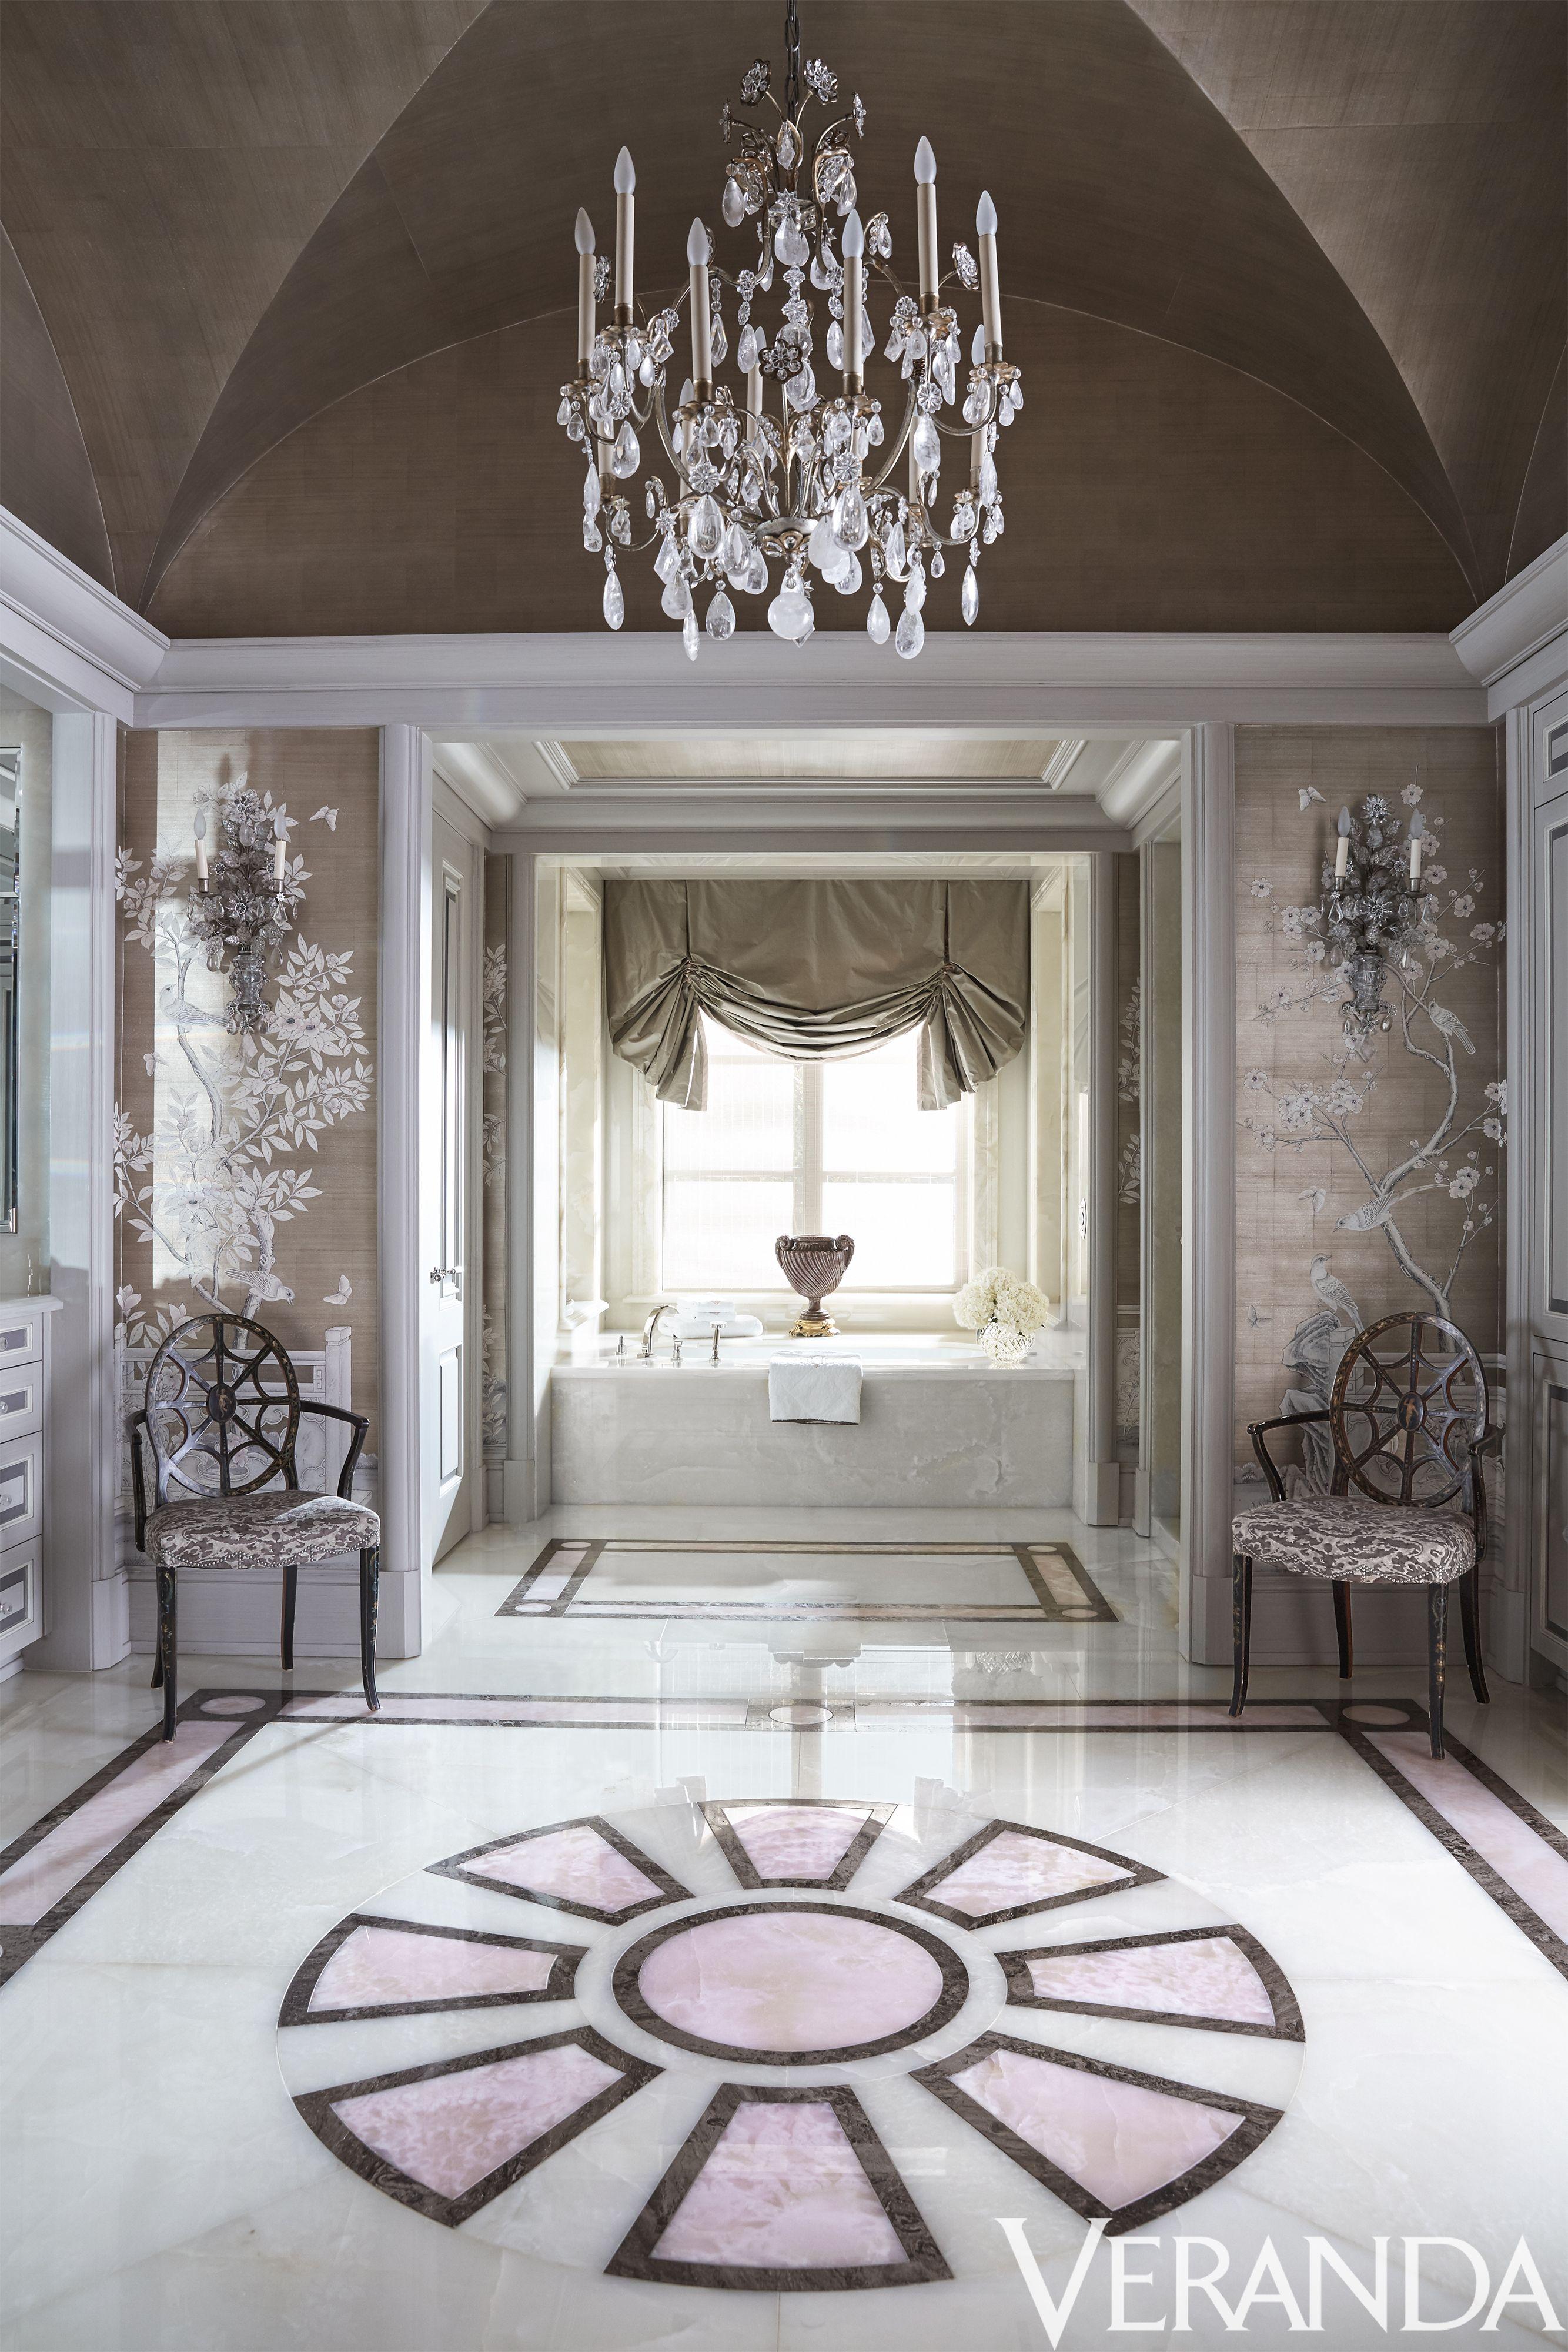 35+ Best Bathroom Design Ideas   Pictures Of Beautiful Bathrooms